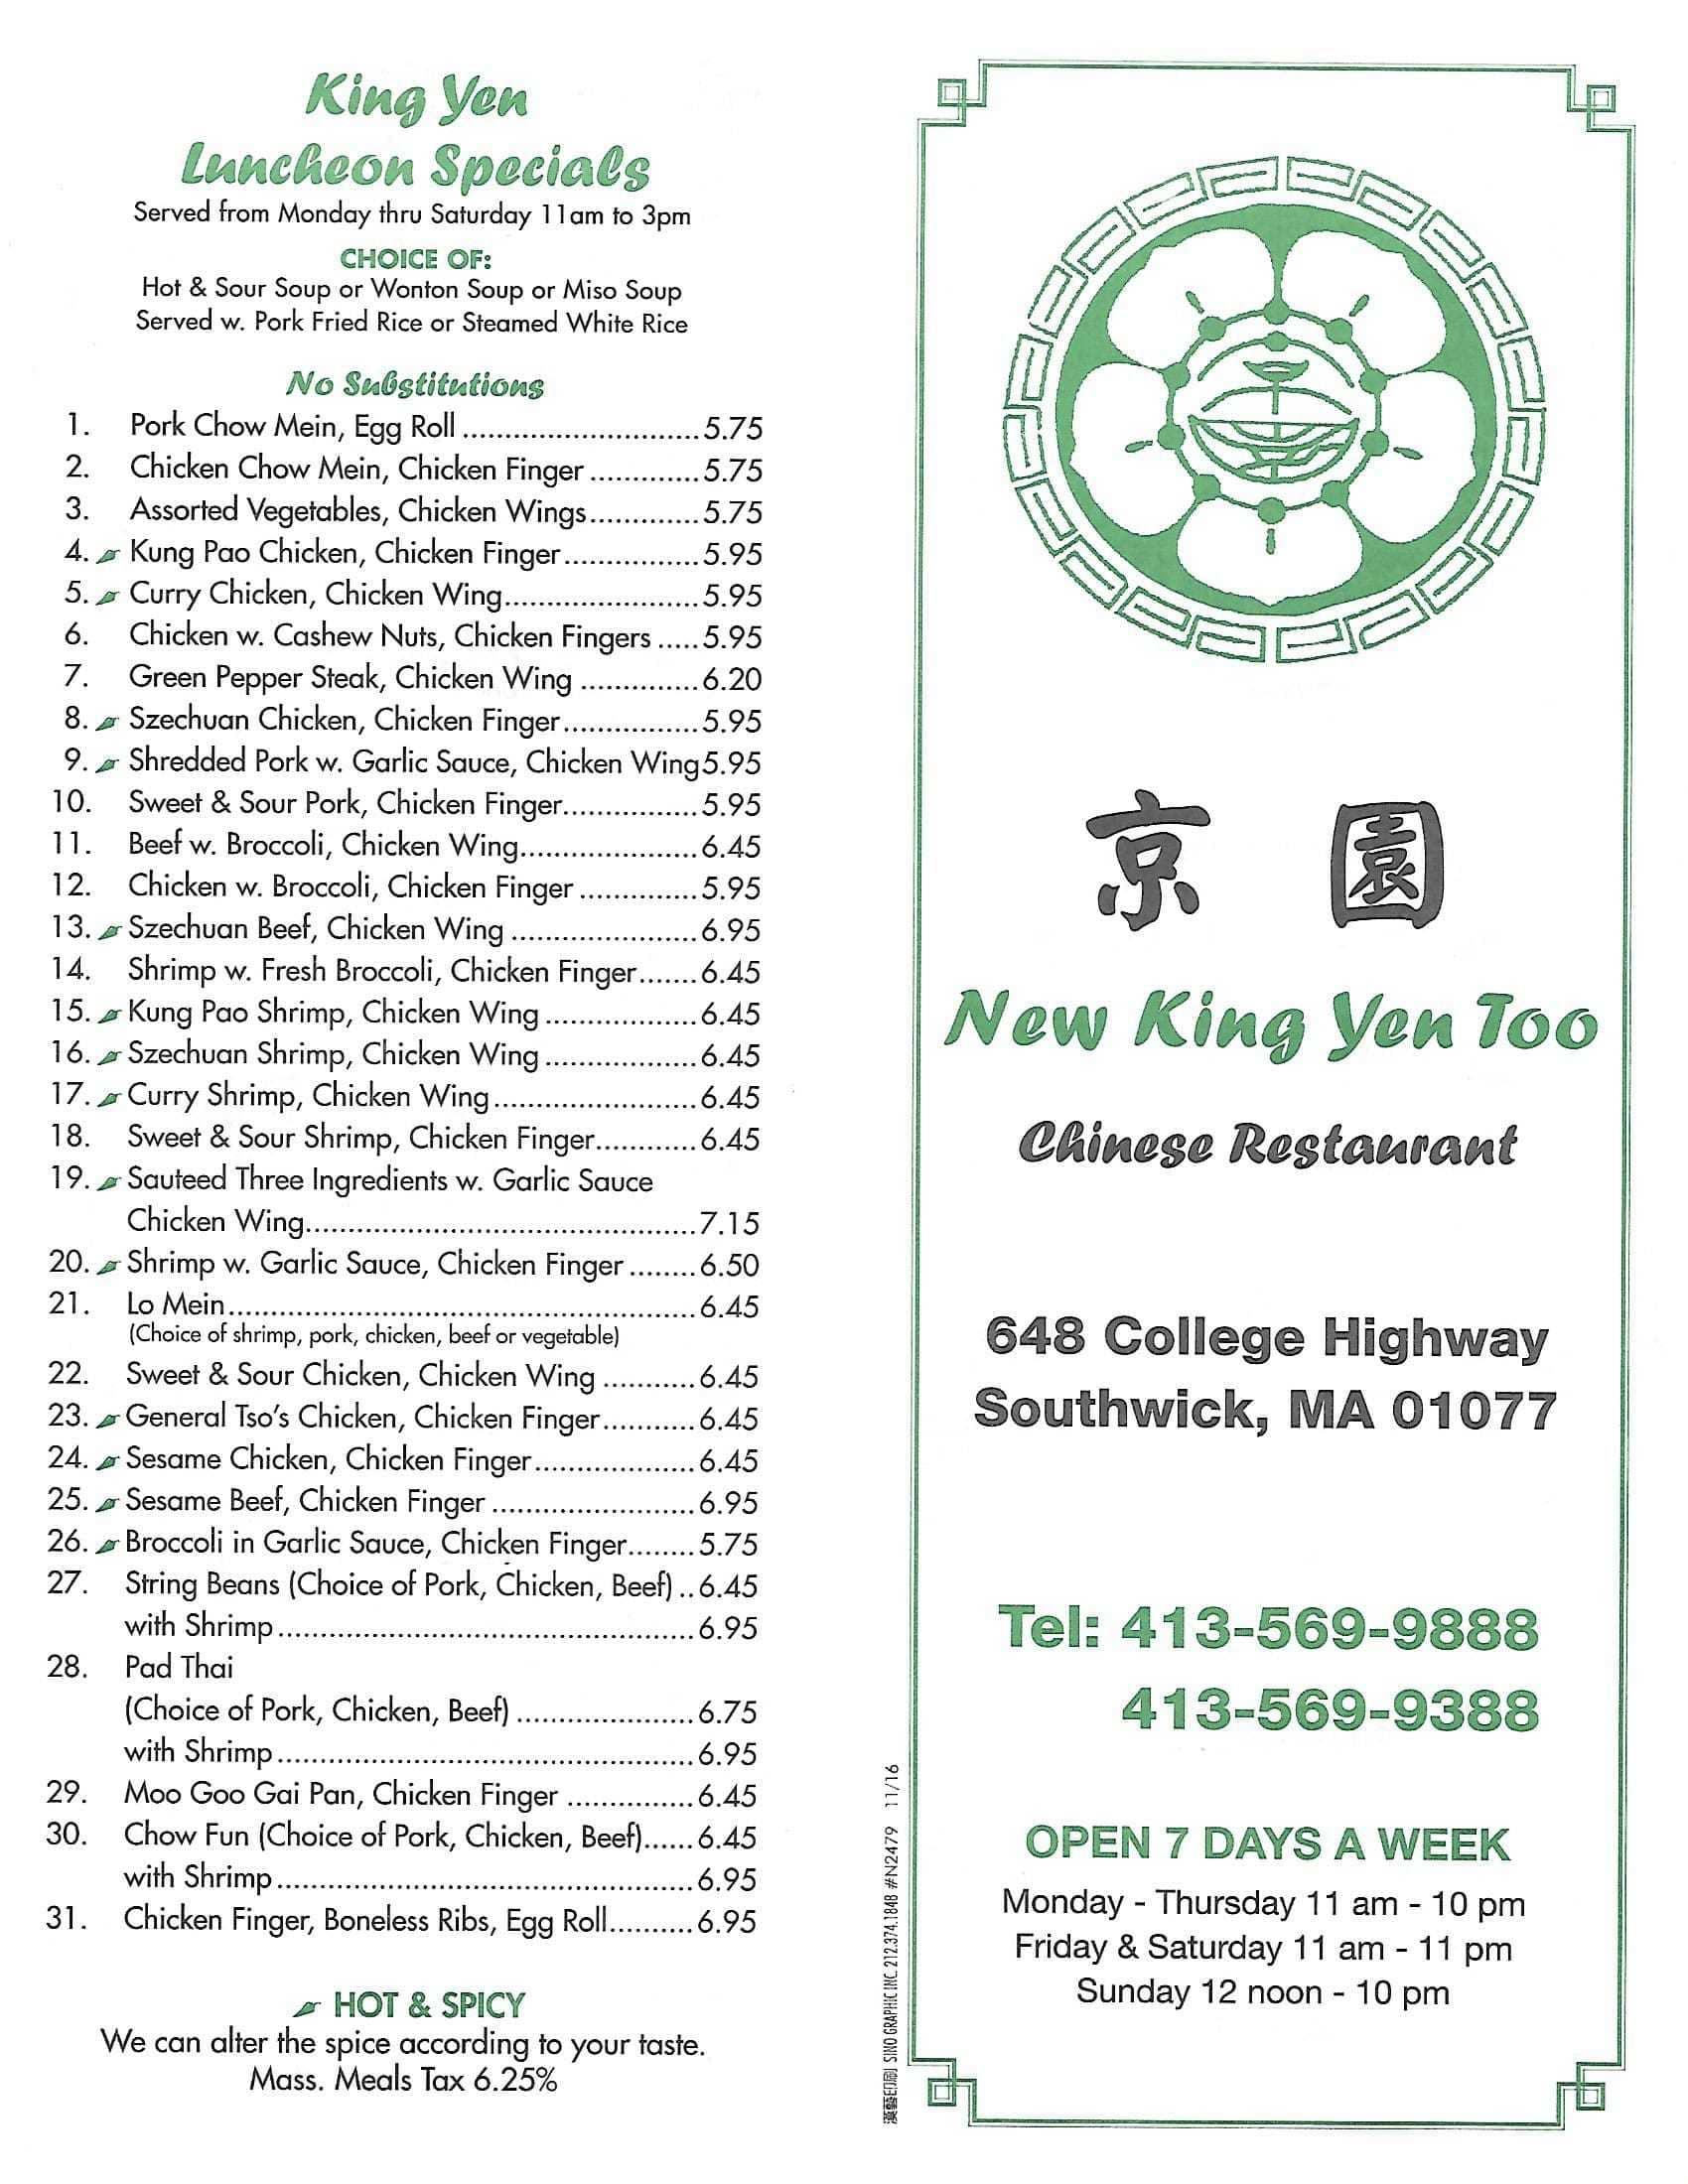 Menu at New King Yen Too restaurant, Southwick